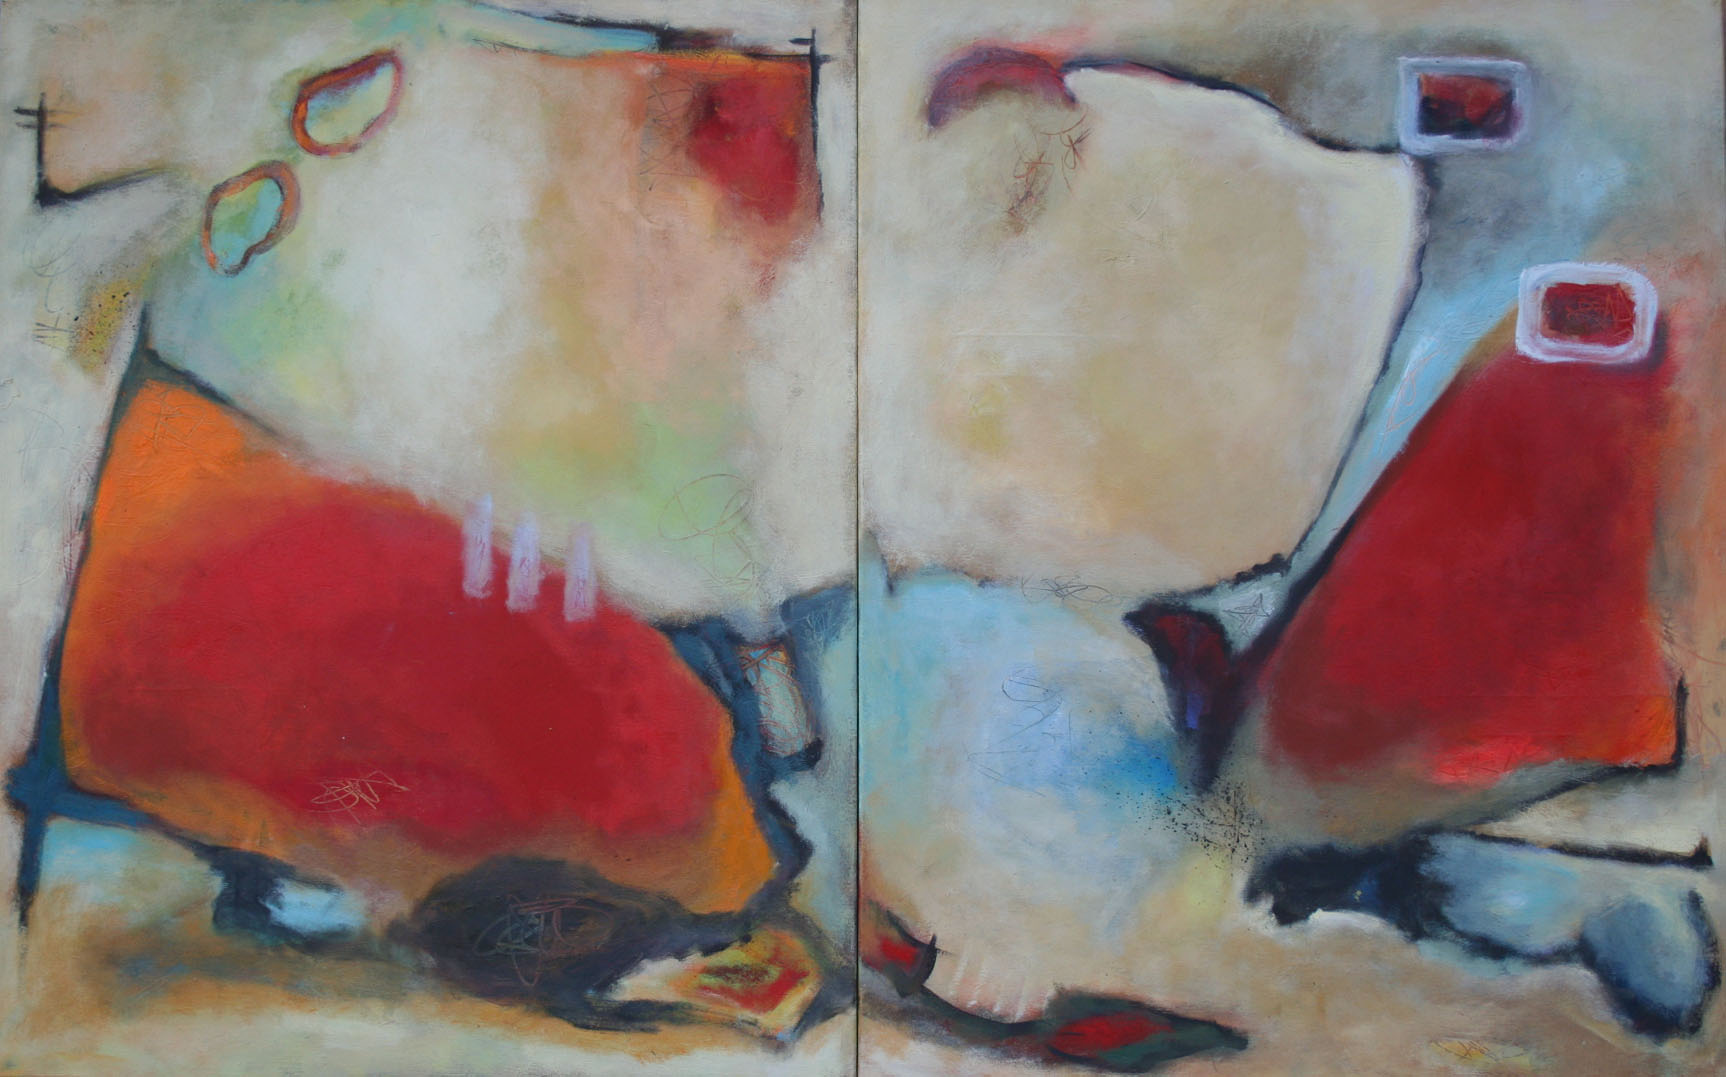 Dialog, Öl und Acryl auf Leinwand, 2-tlg,  je 100 x 80 cm